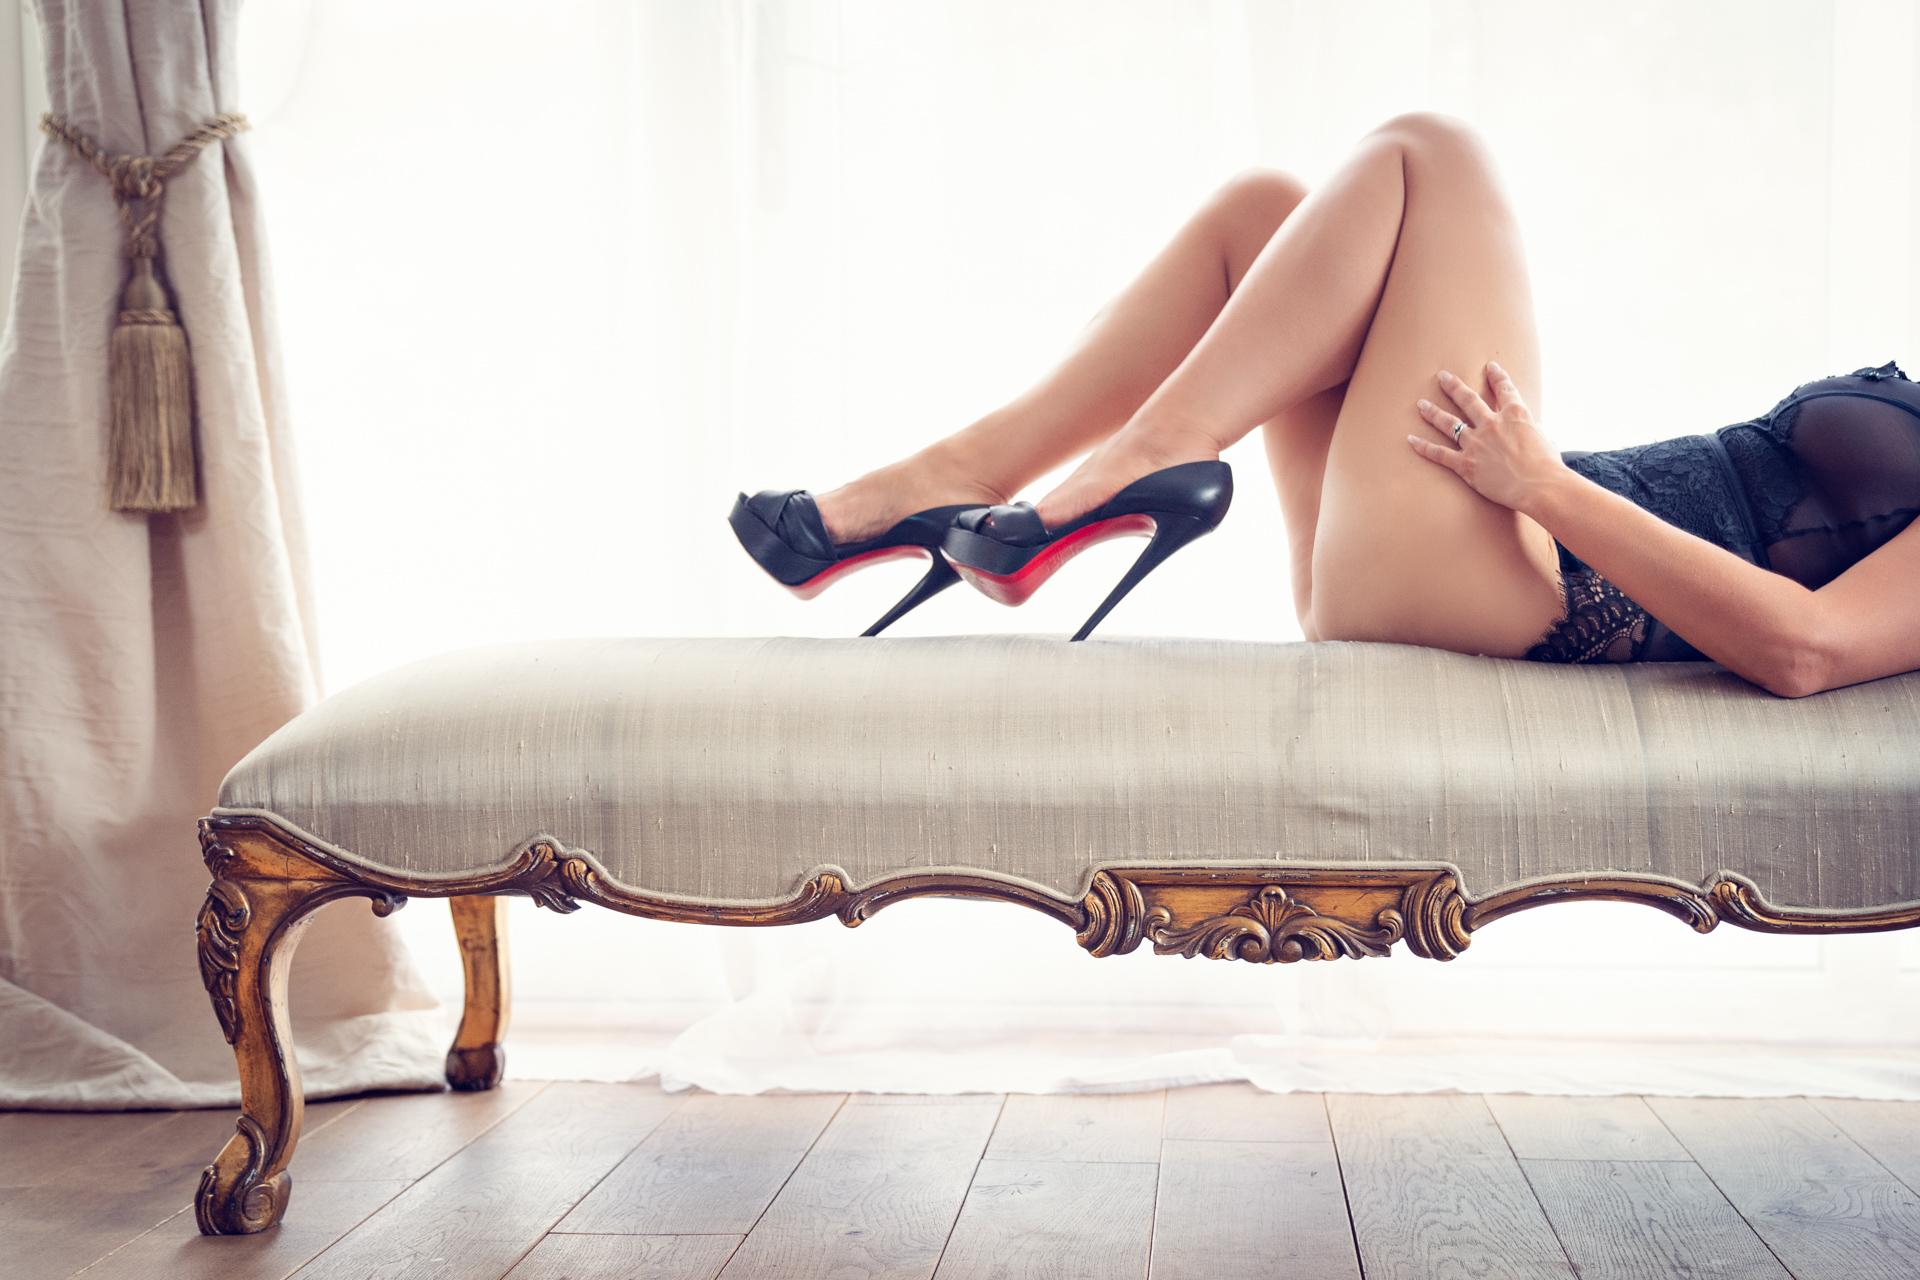 https://katehopewellsmith.com/wp-content/uploads/boudoir-photography-inspiration-kate-hopewell-smith-11.jpg